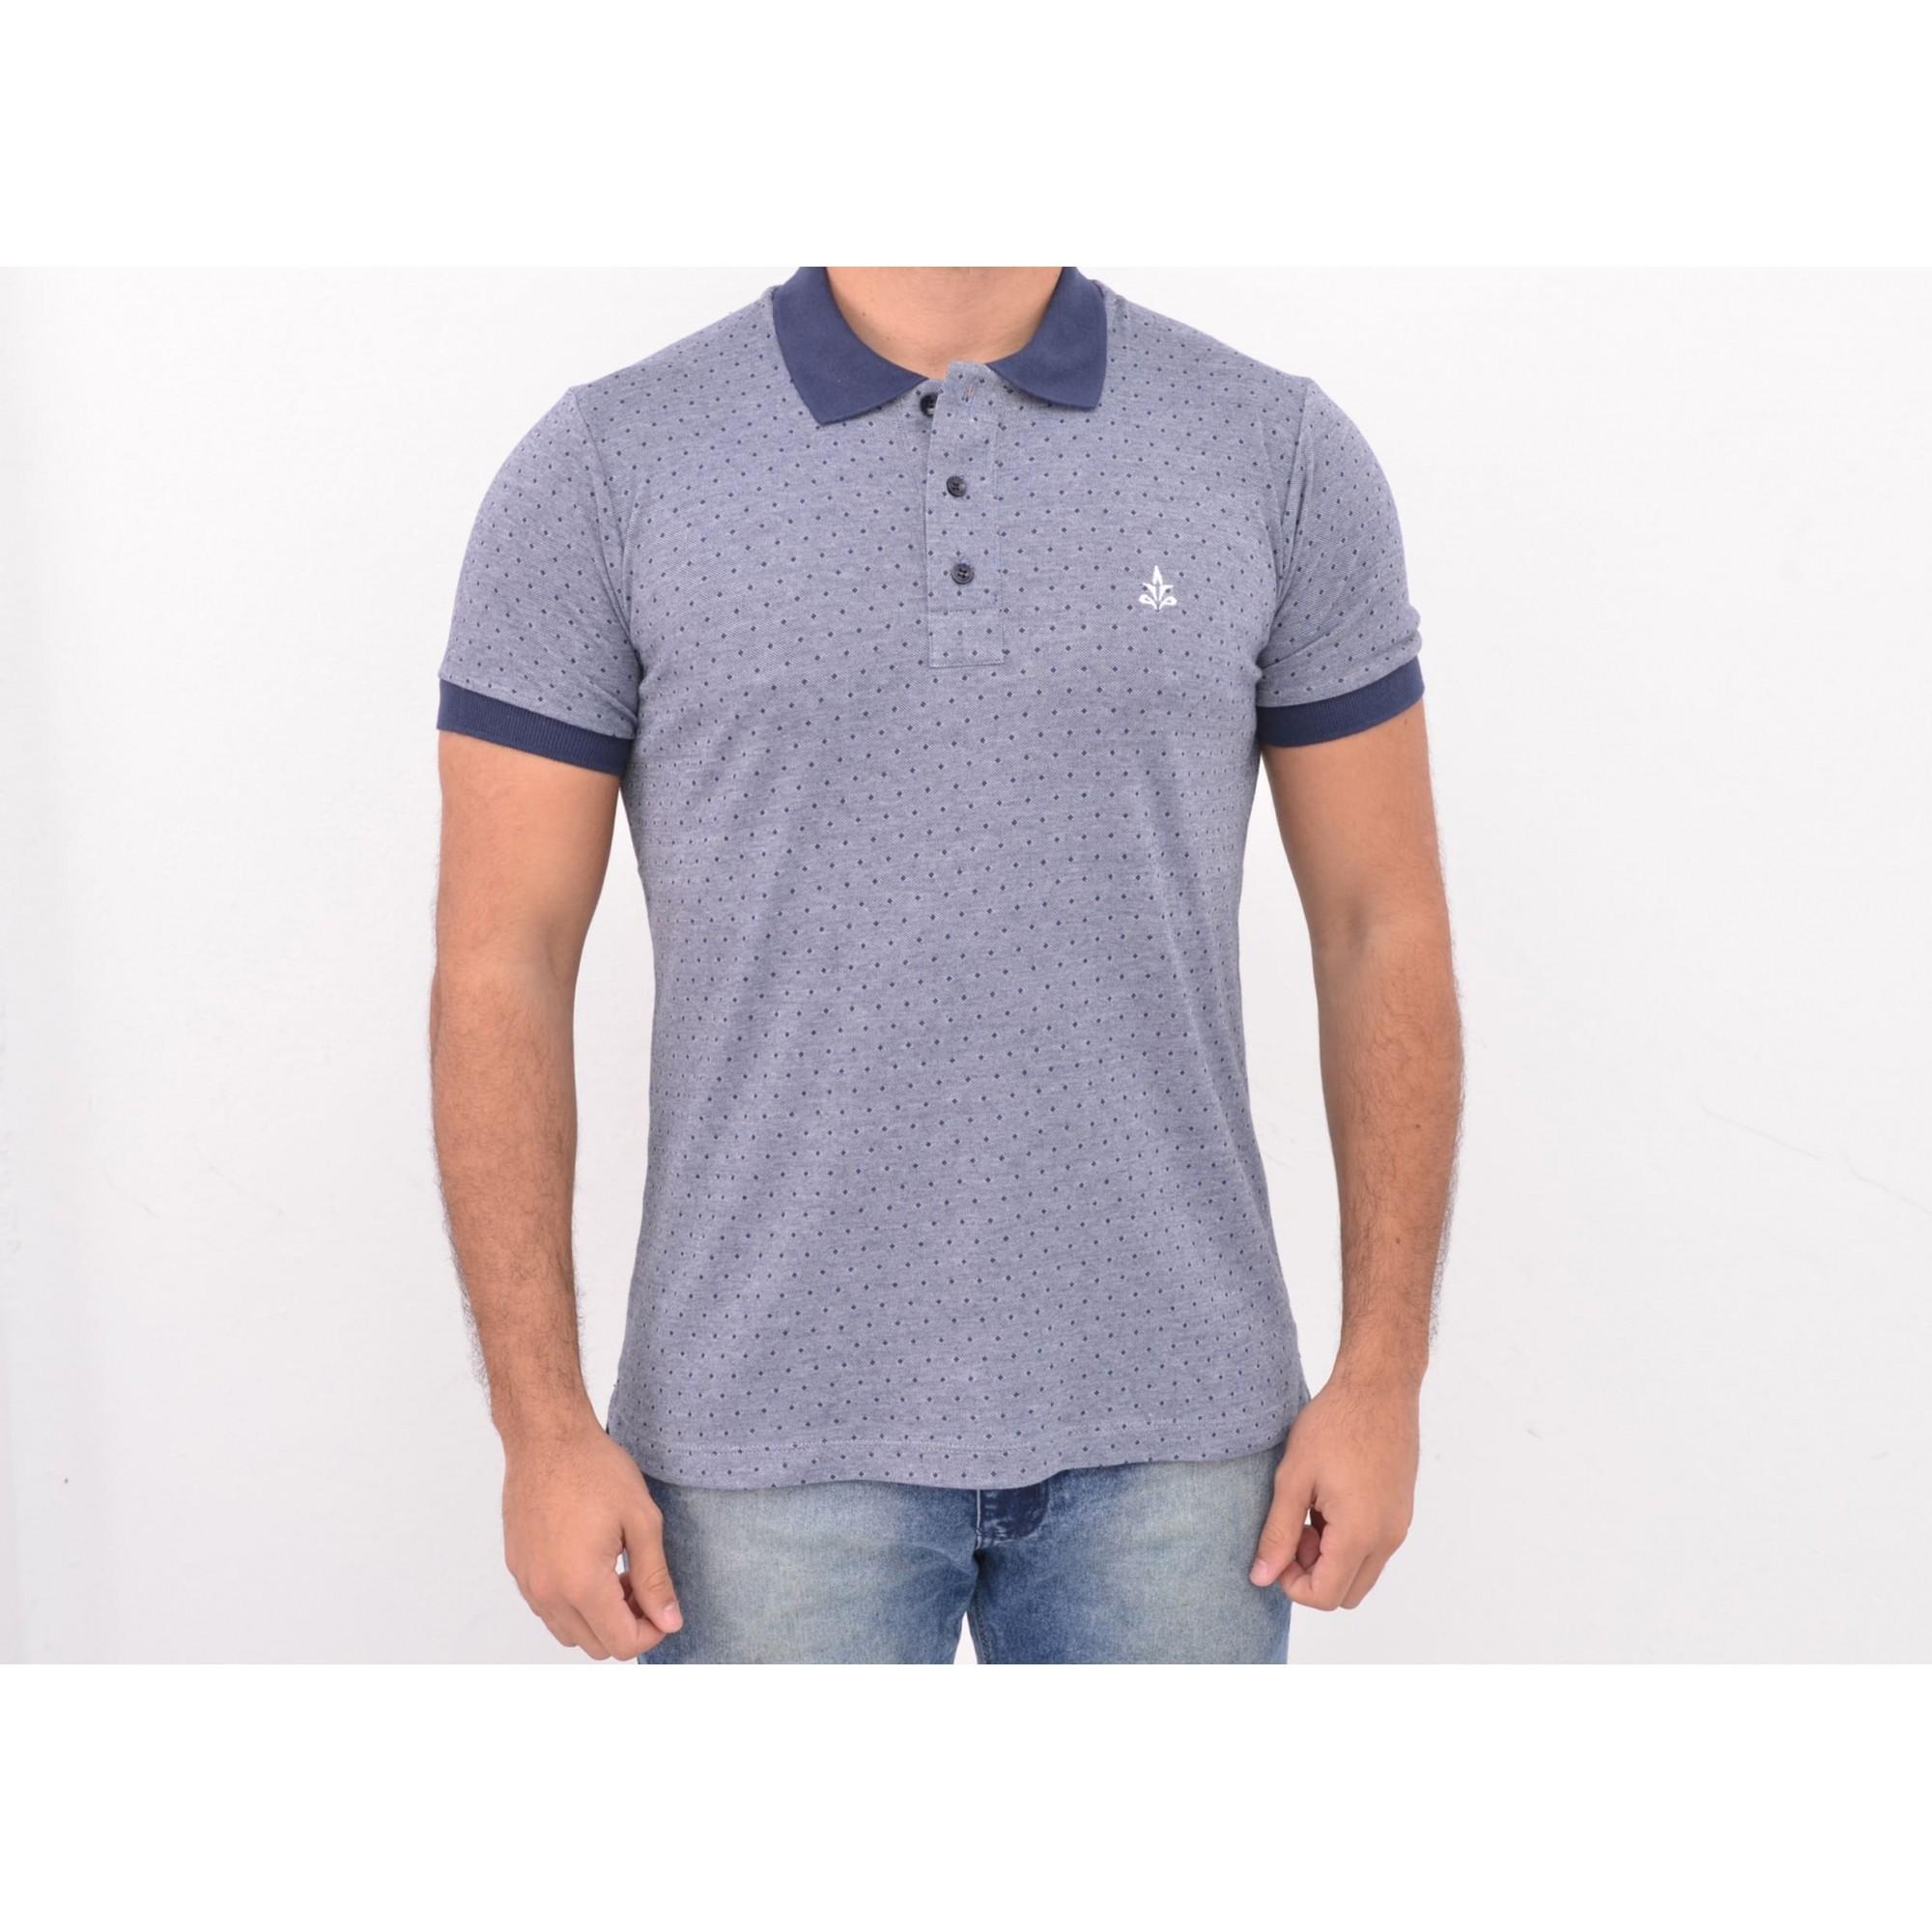 Camisa Barrocco Pólo Point's Azul - FRETE GRÁTIS